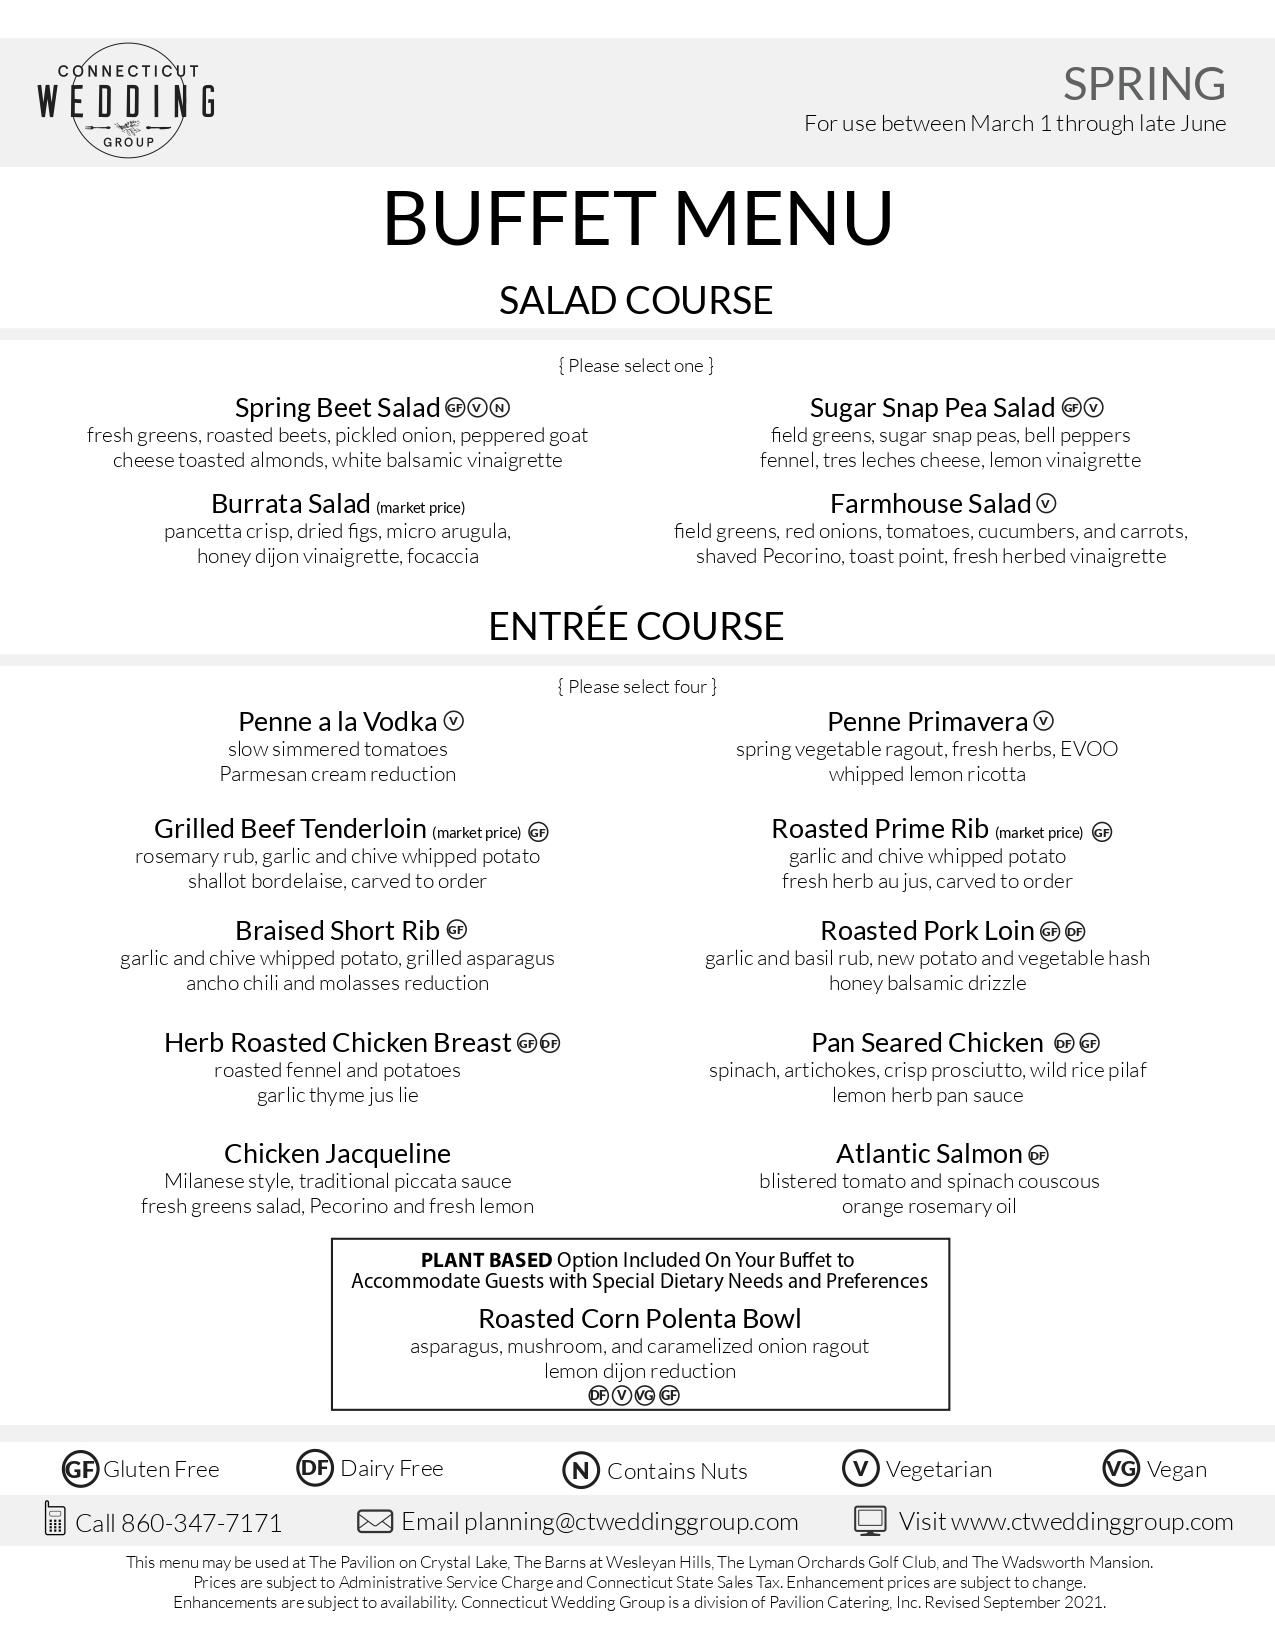 Spring-Buffet-Menu-2022_NEW_page-0001-1